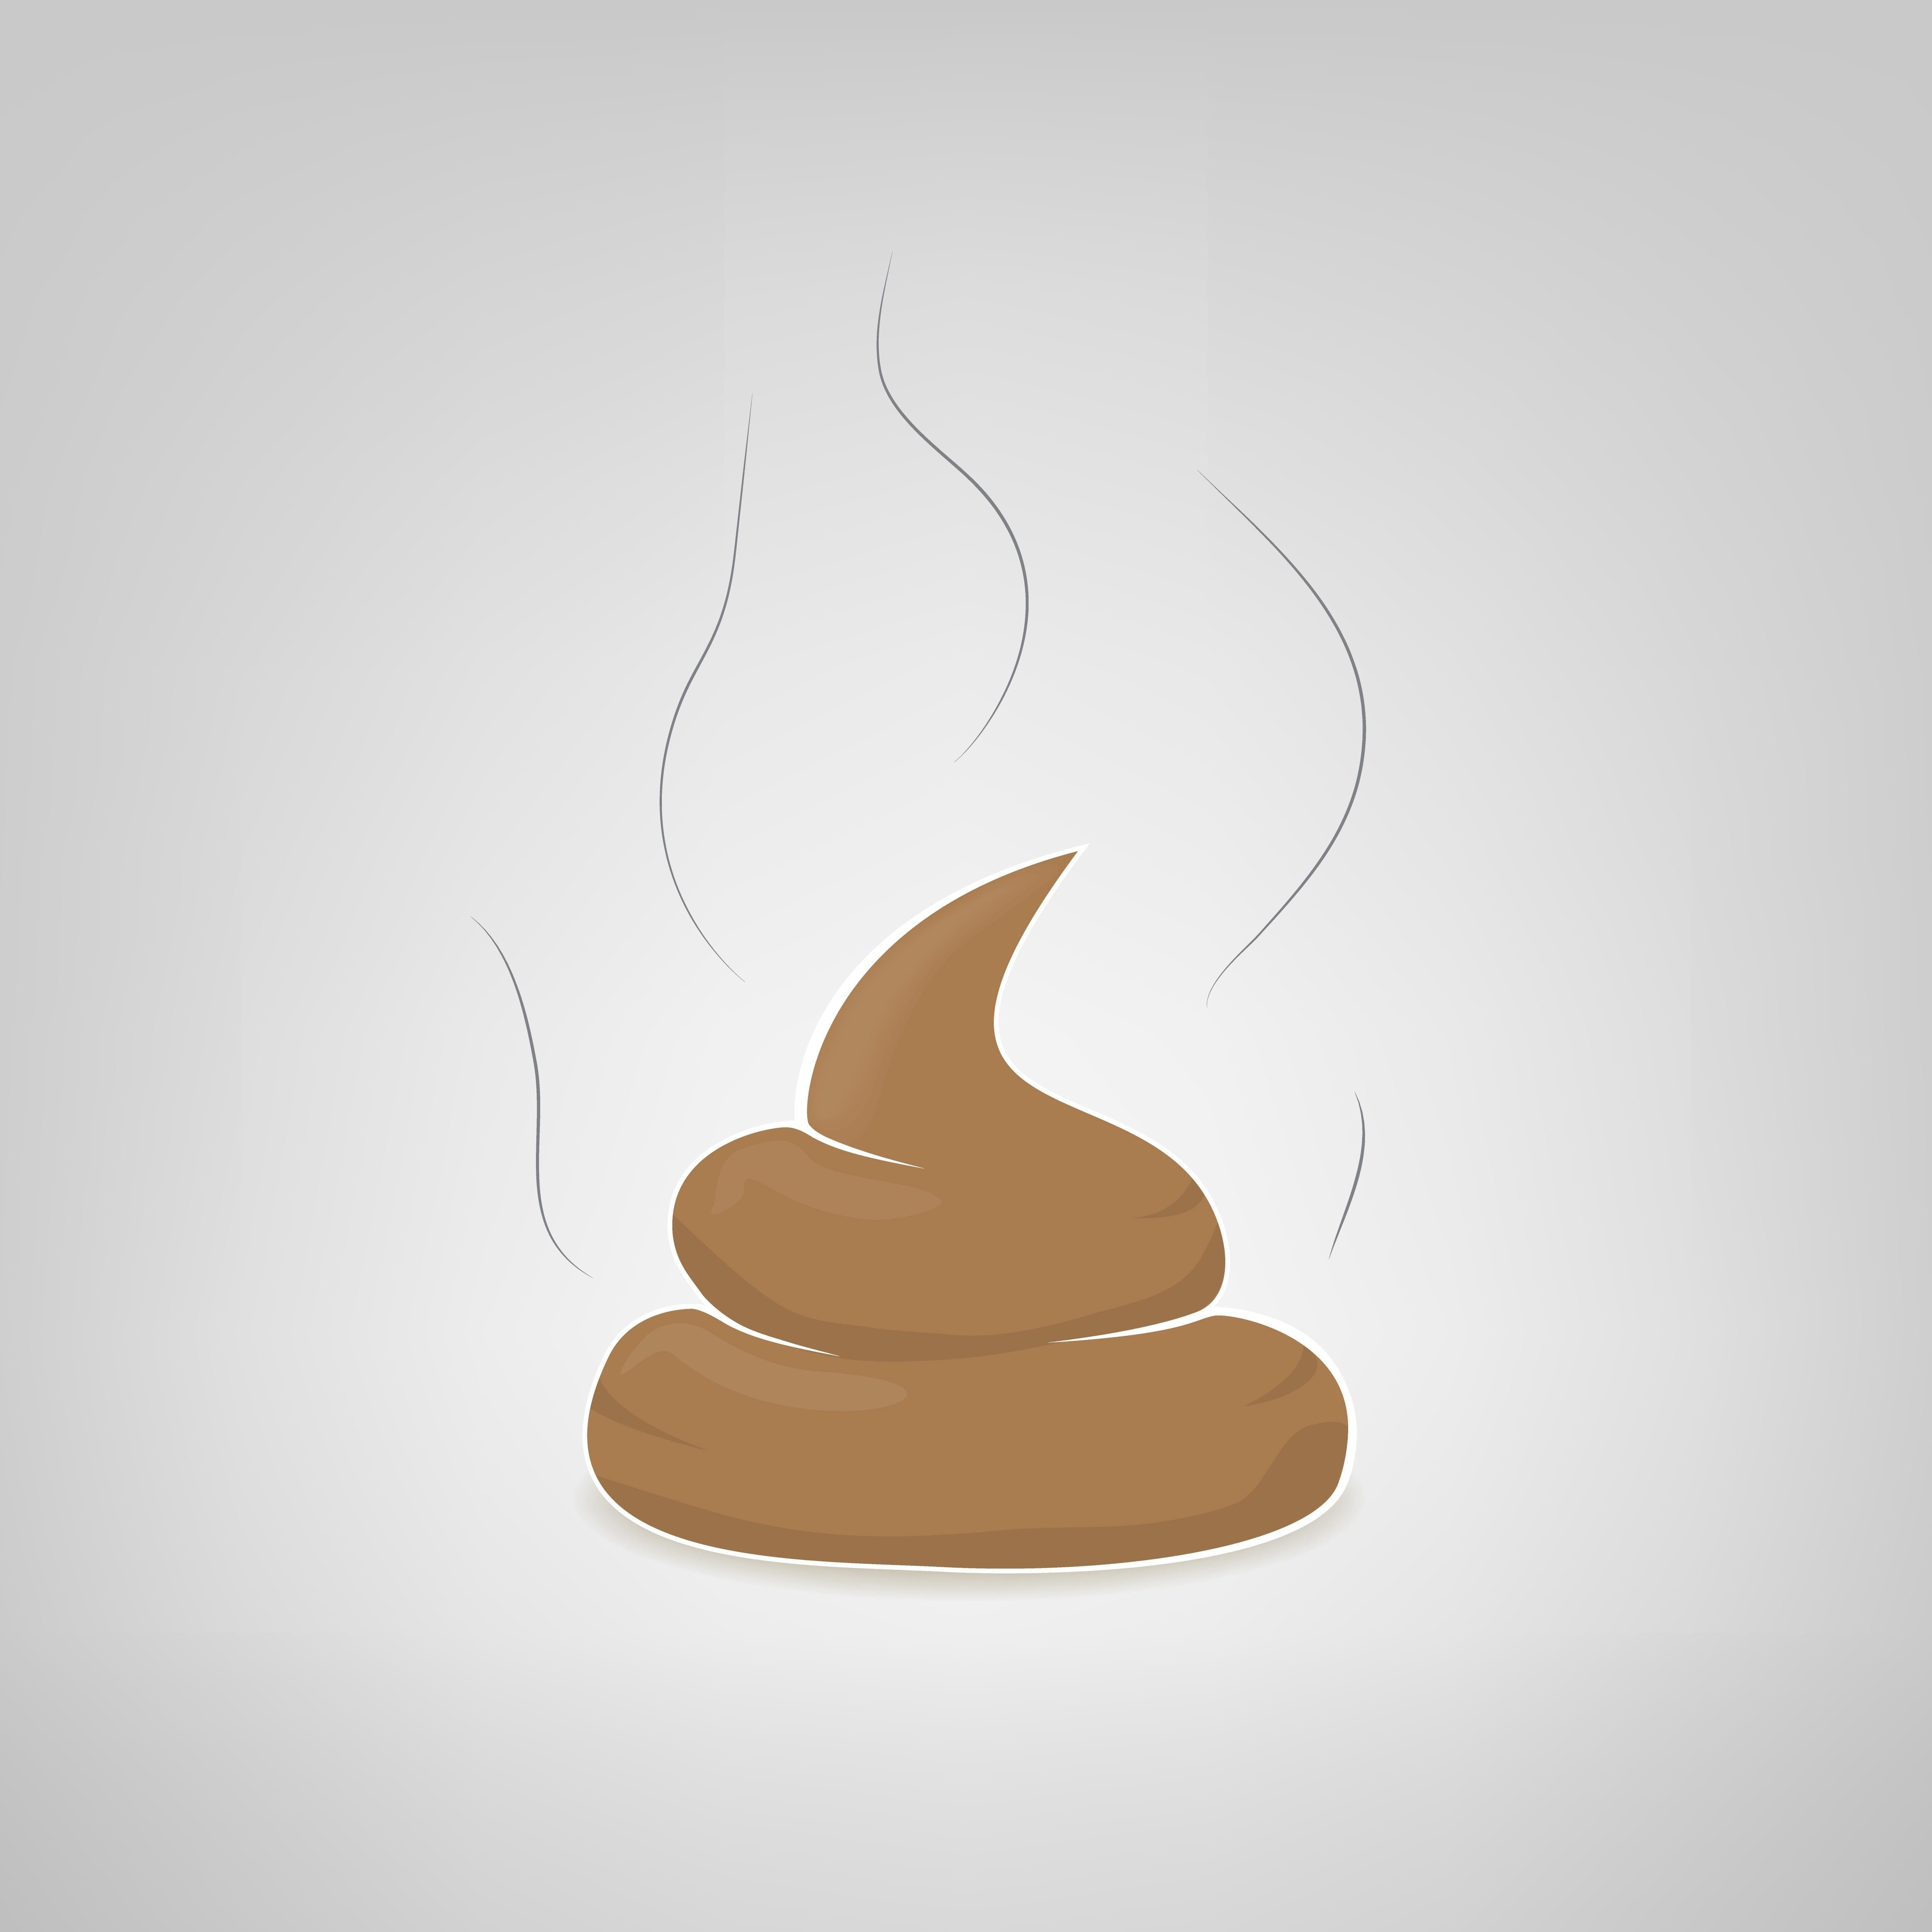 illustration of a steaming pile of poop